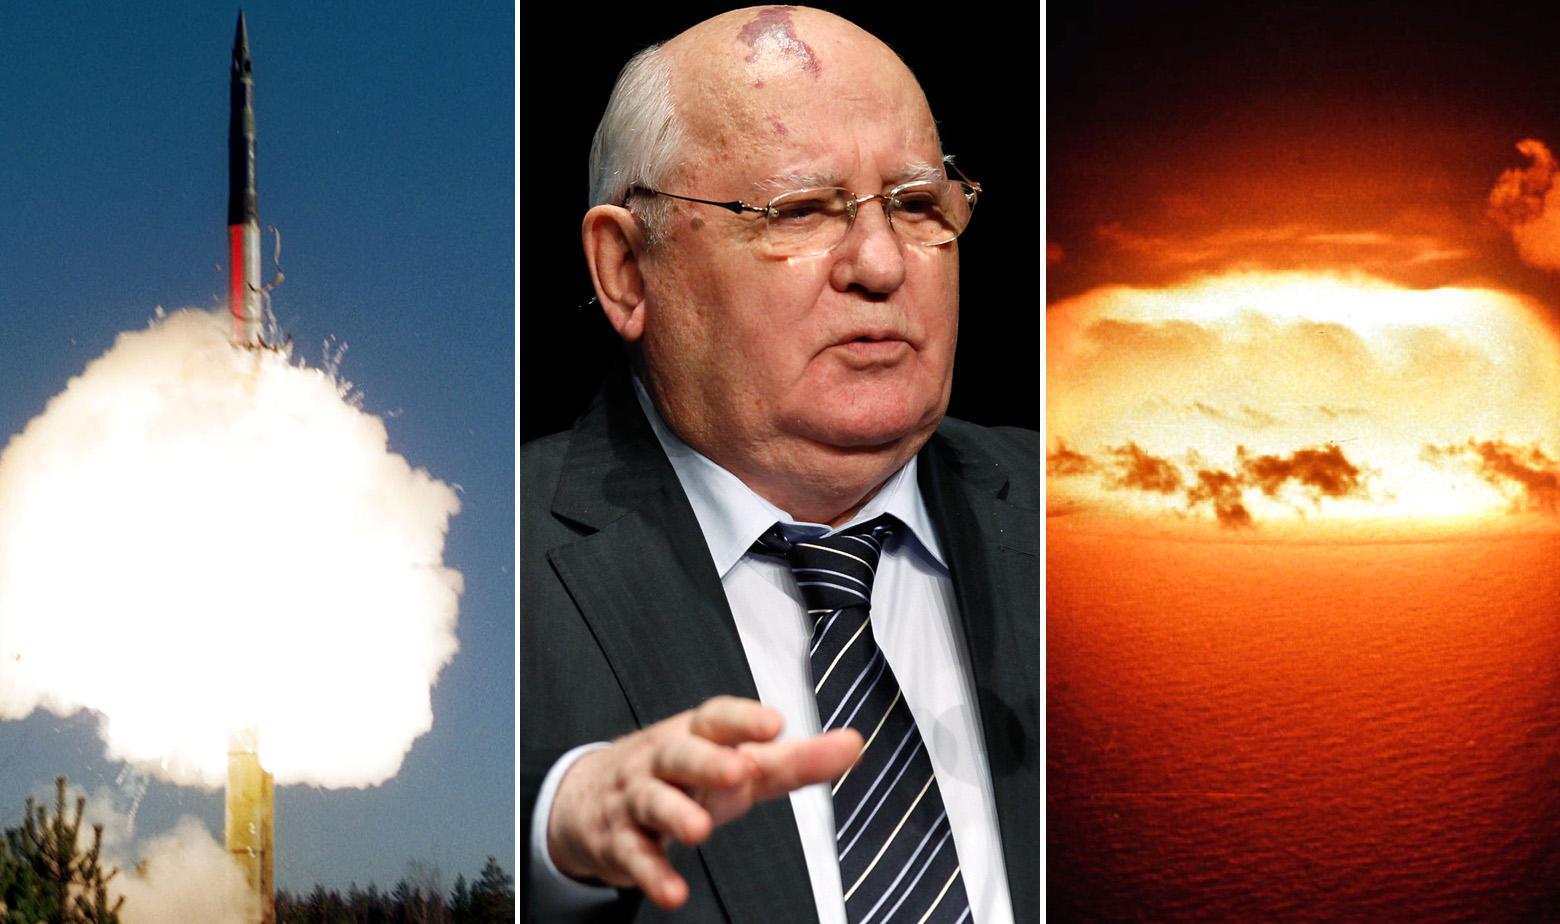 Balistički projektil Topol M, Mihail Gorbačov, testiranje H-bombe na atolu Enewetak 1956.